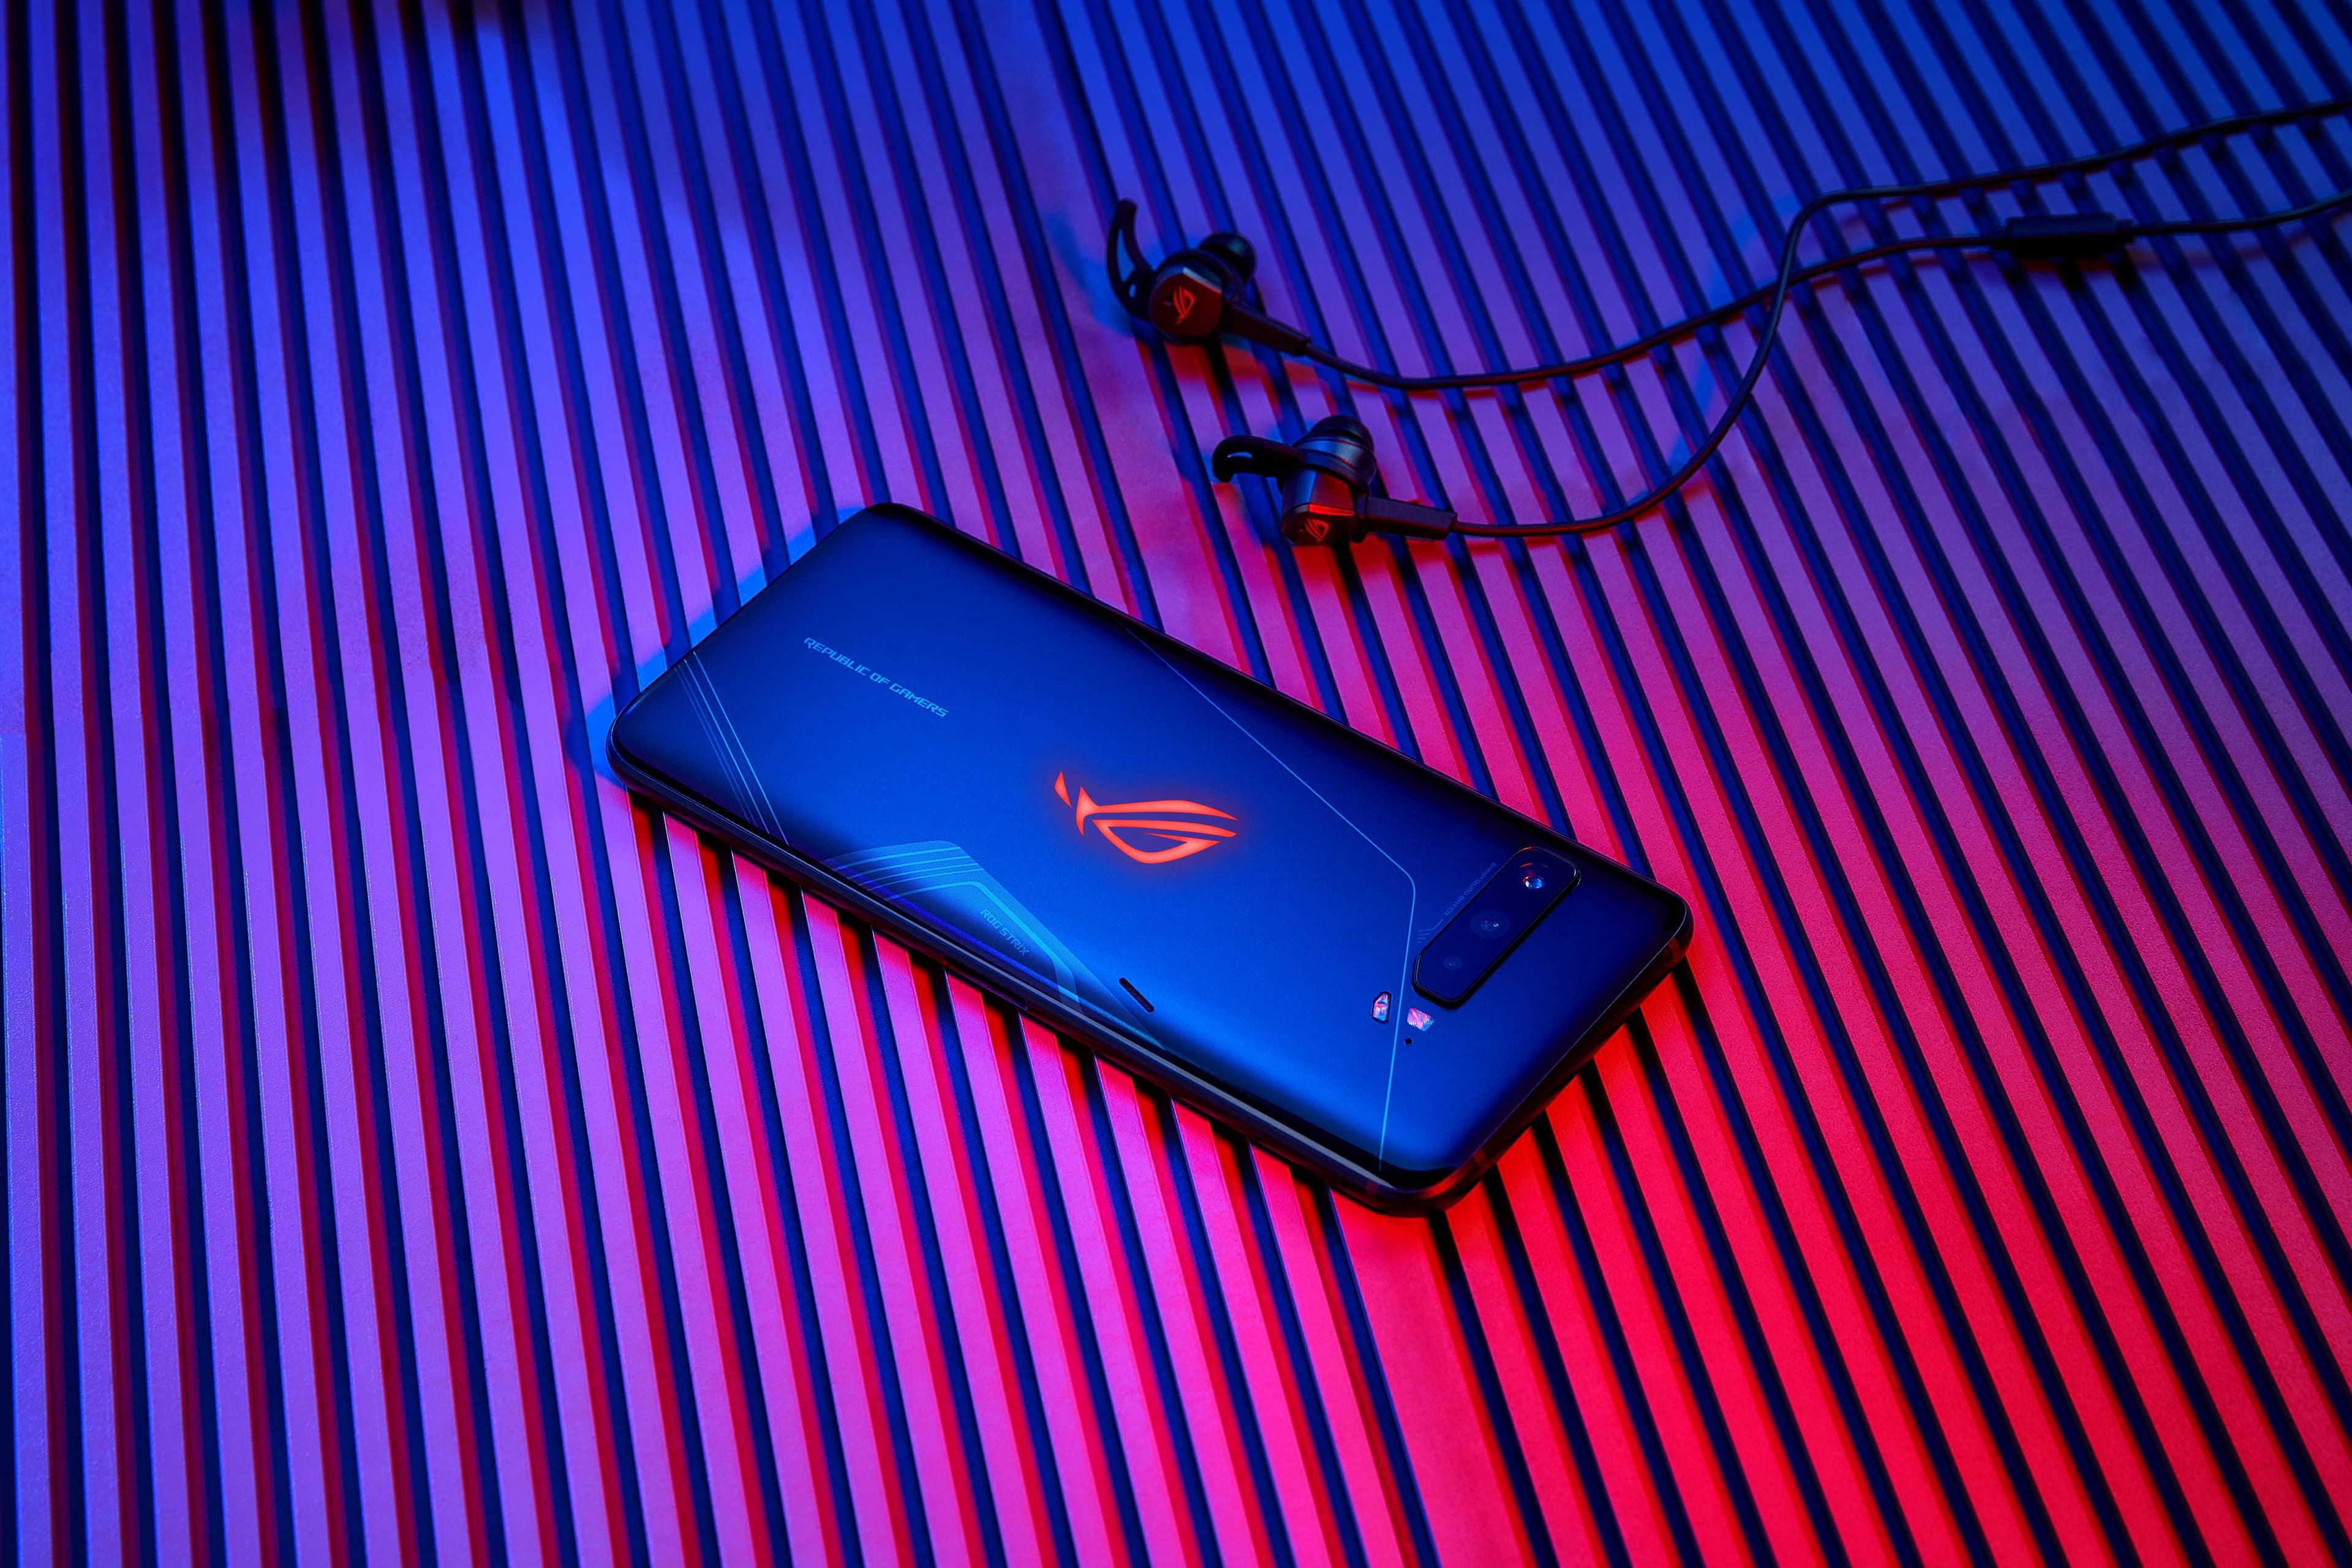 Le top des meilleurs smartphones de gaming en 2021